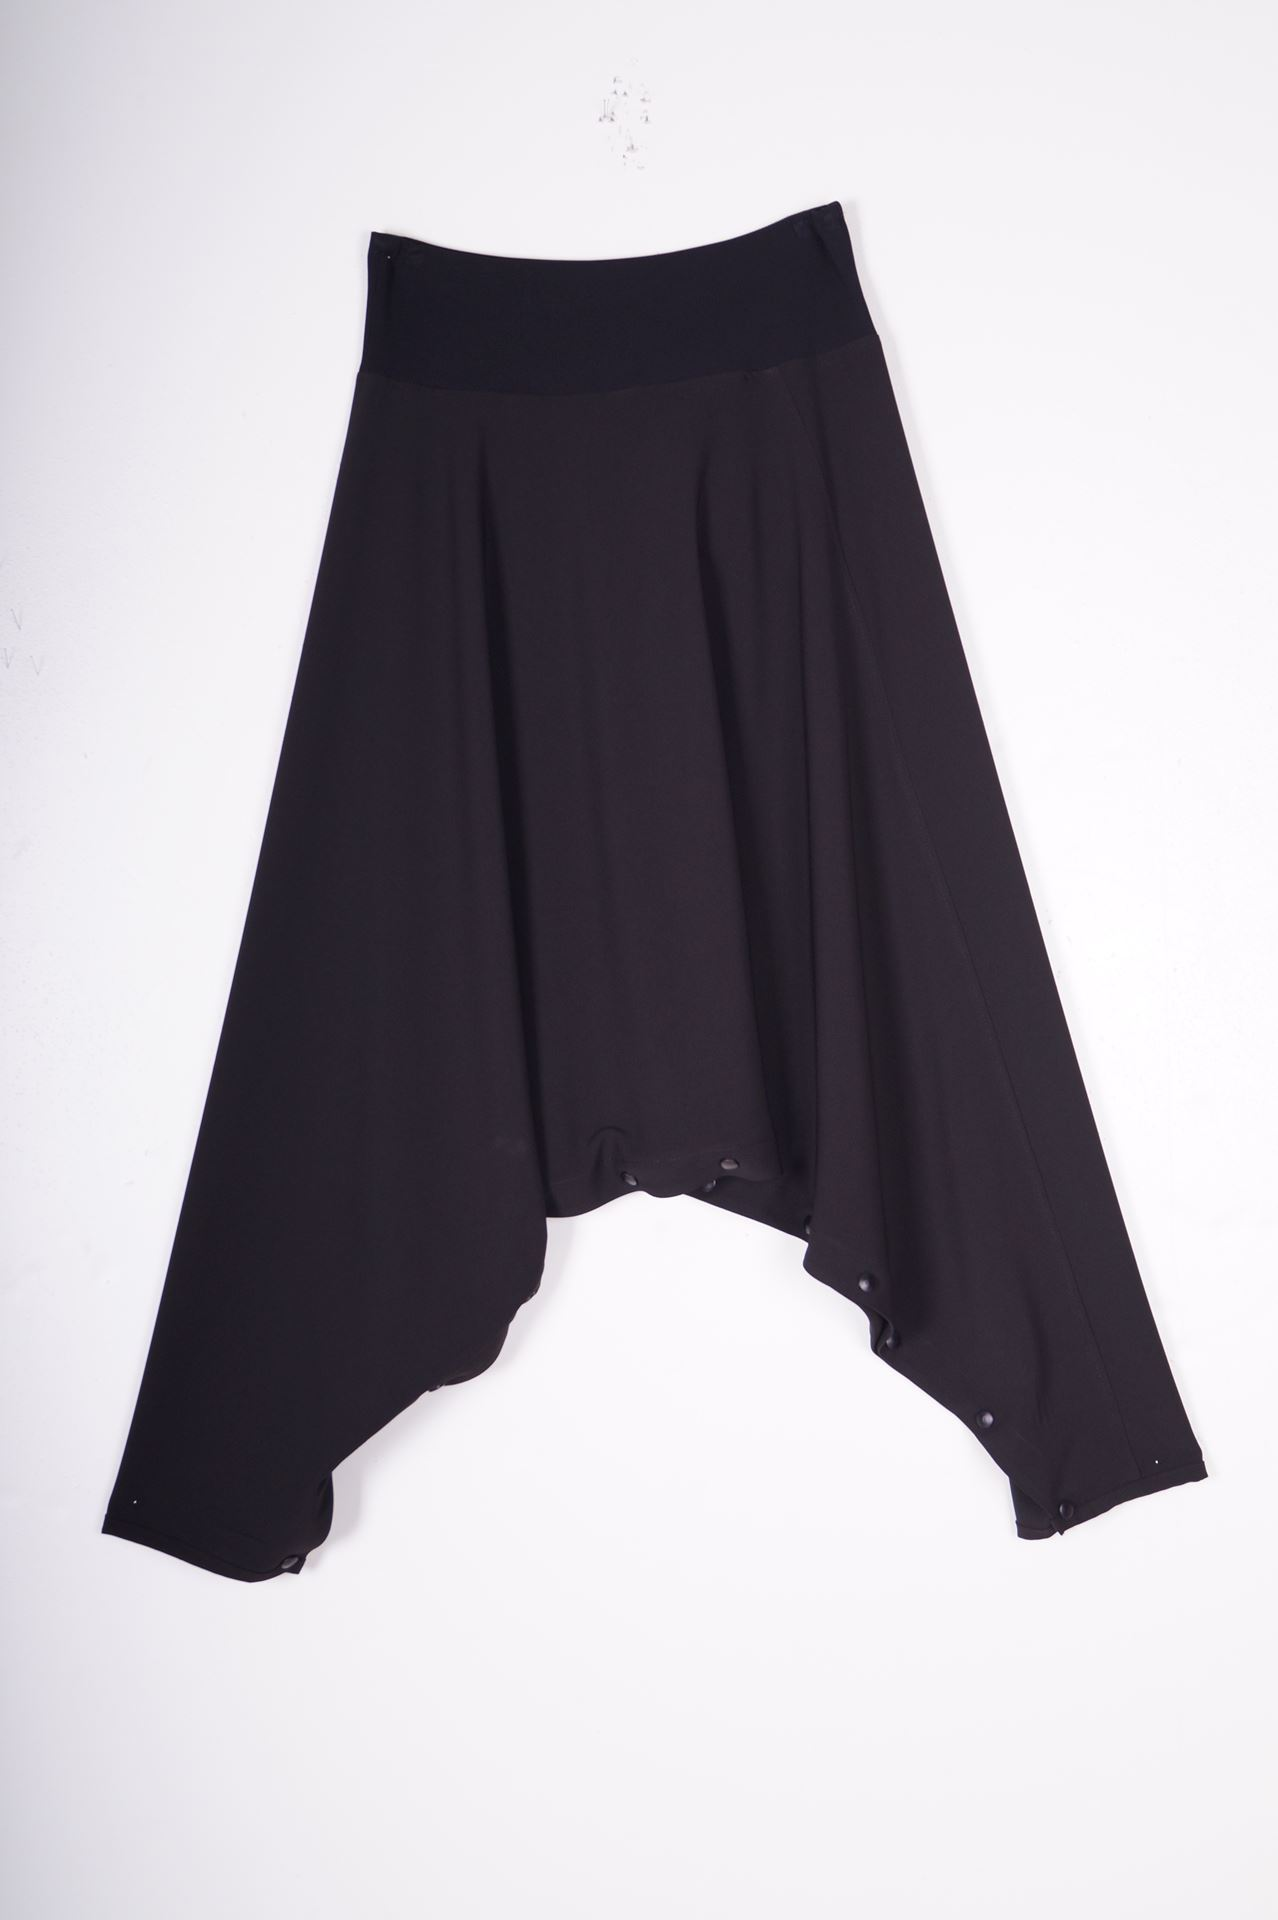 riesige Auswahl an Top-Mode aktuelles Styling elegante Haremshose